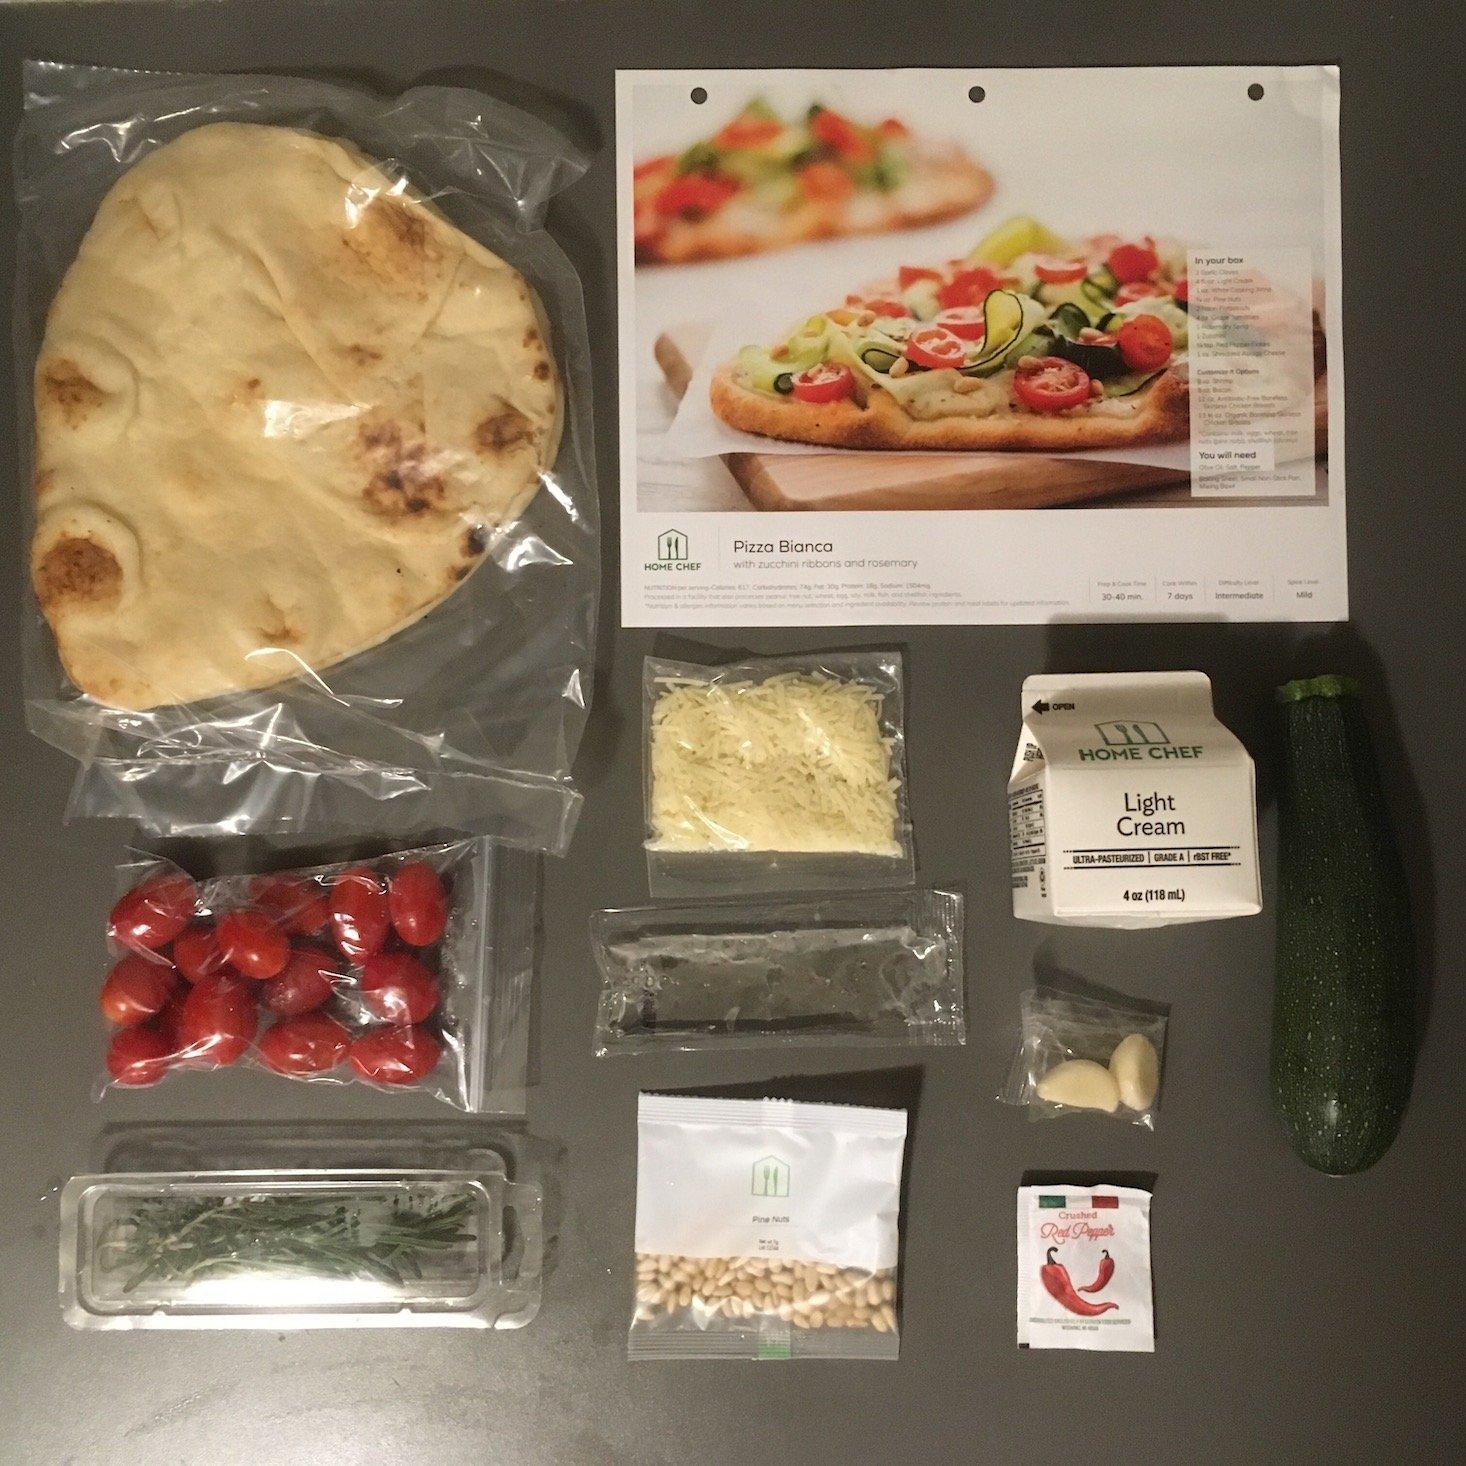 pizza bianca ingredients laydown